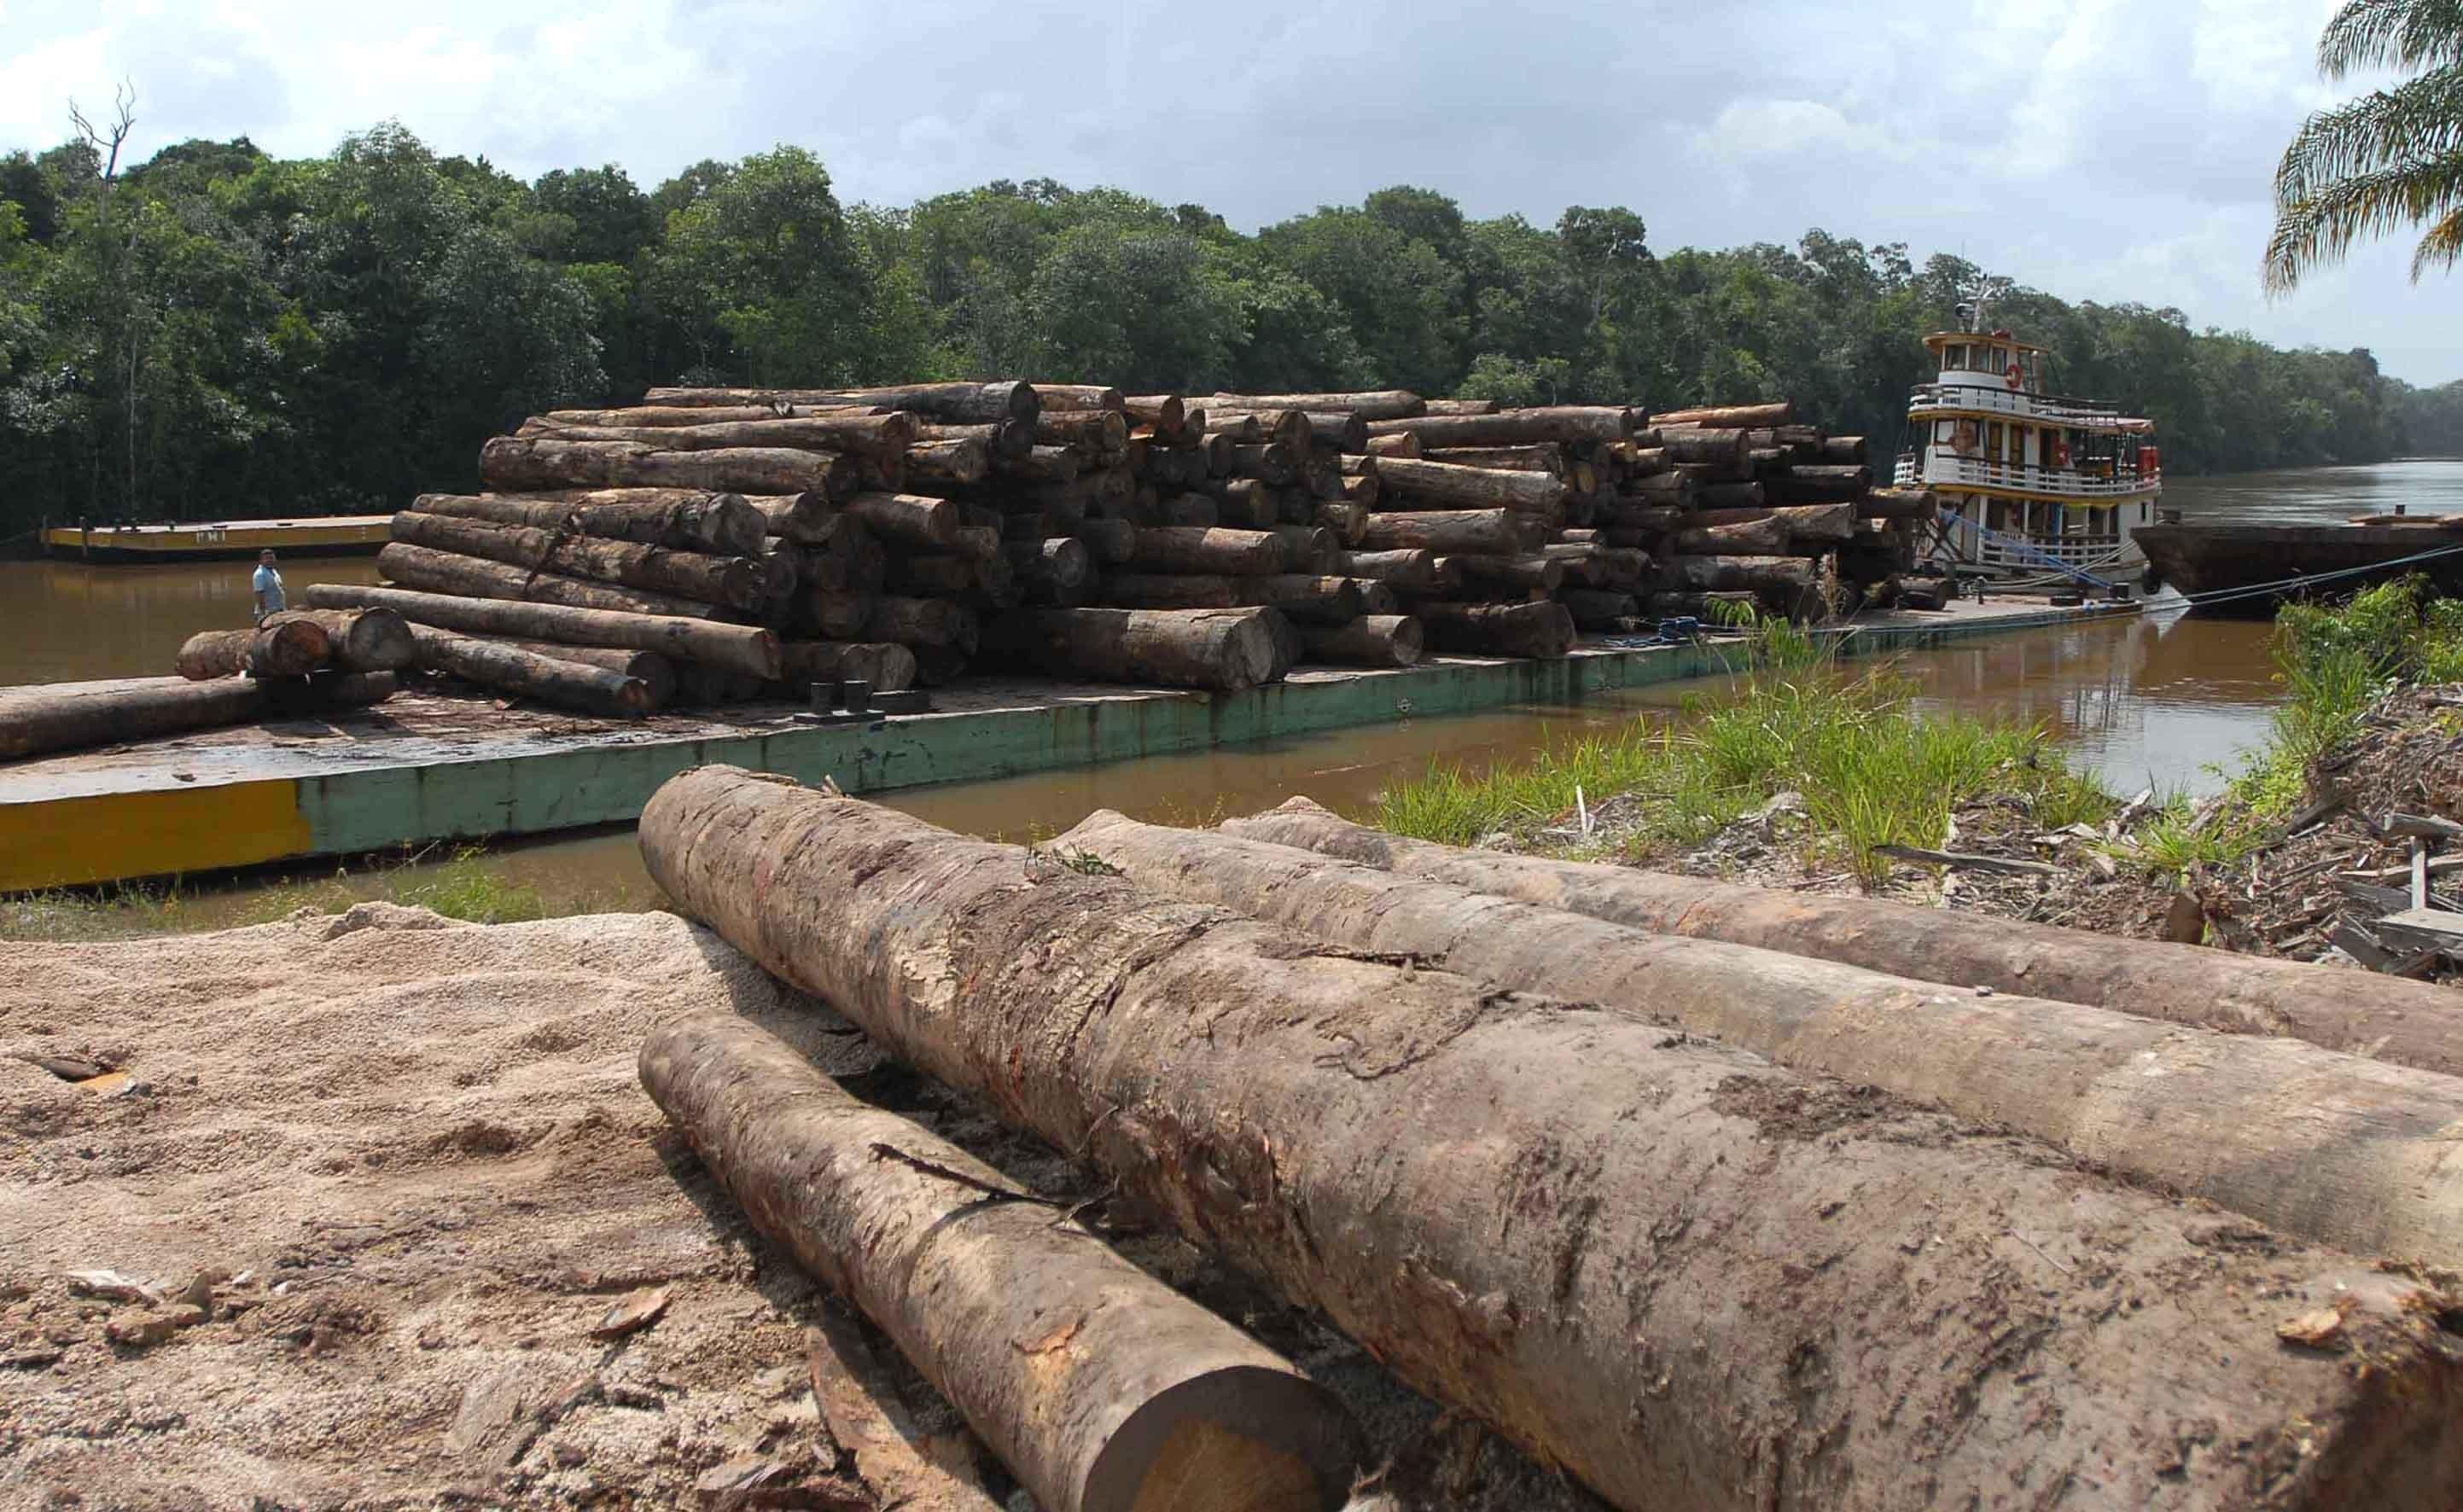 Desmatamento na Amazônia (Foto: Wikimedia Commons )